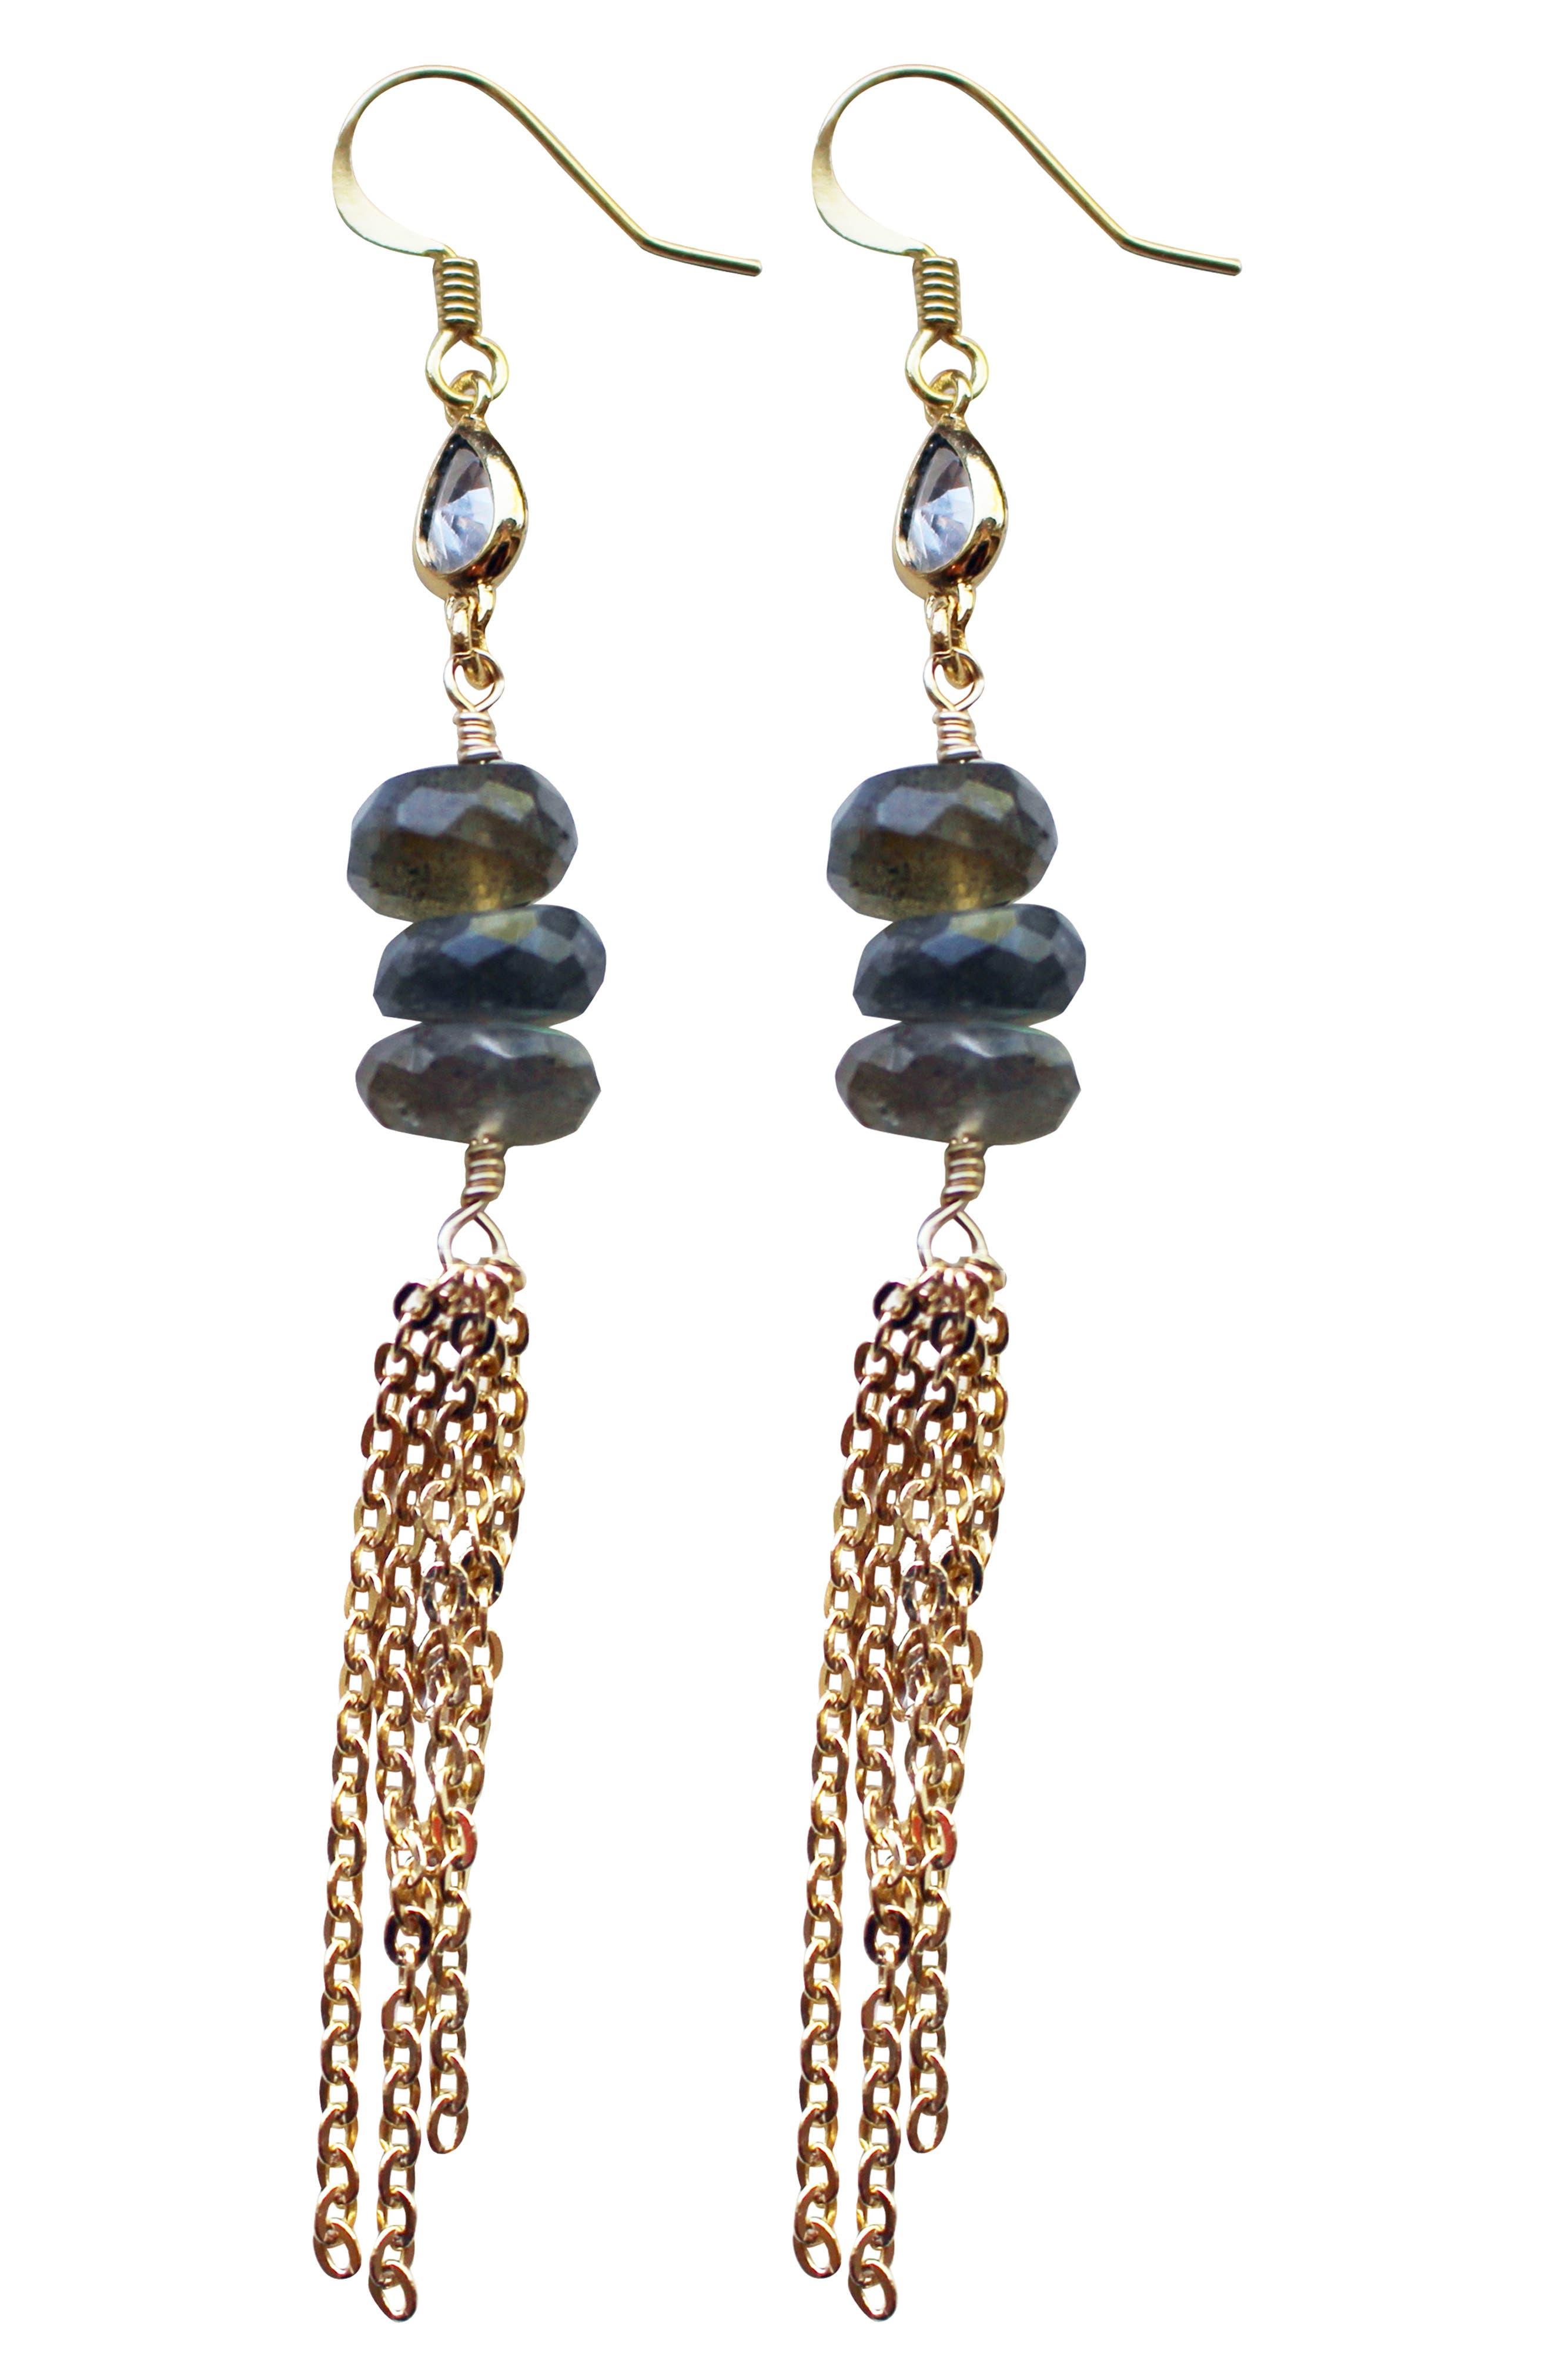 Stone & Tassel Drop Earrings,                         Main,                         color, LABRADORITE